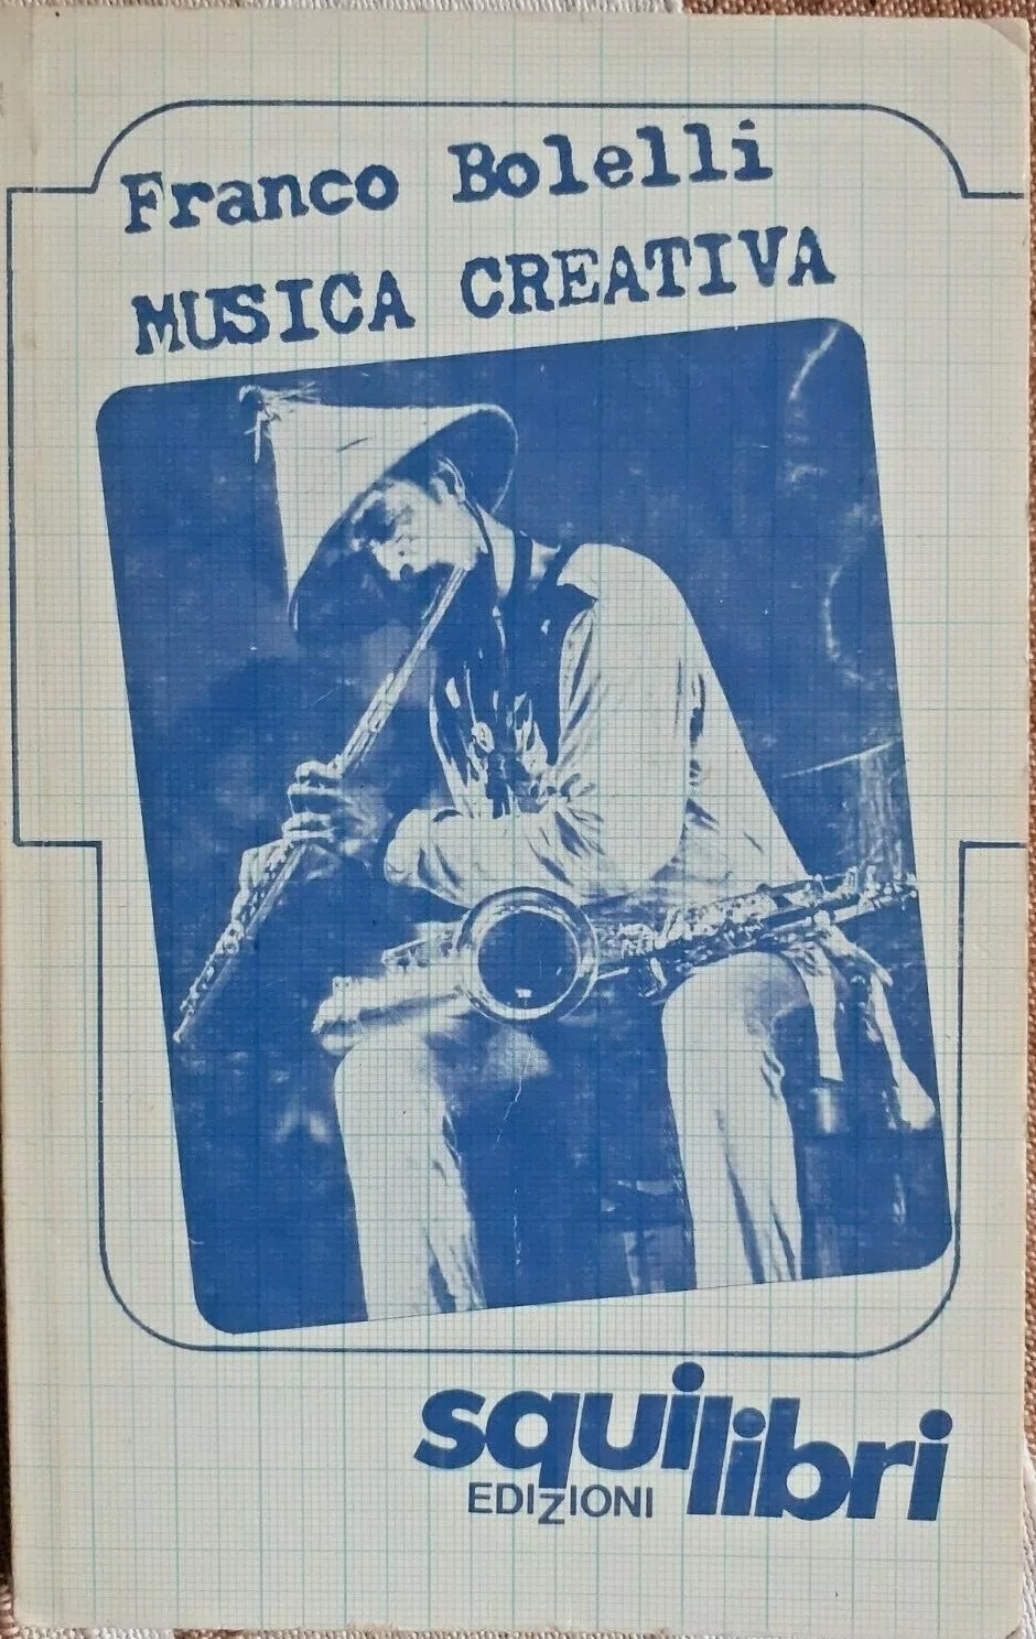 Franco Bolelli – MUSICA CREATIVA – Squilibri Edizioni 1978 RARISSIMO jazz